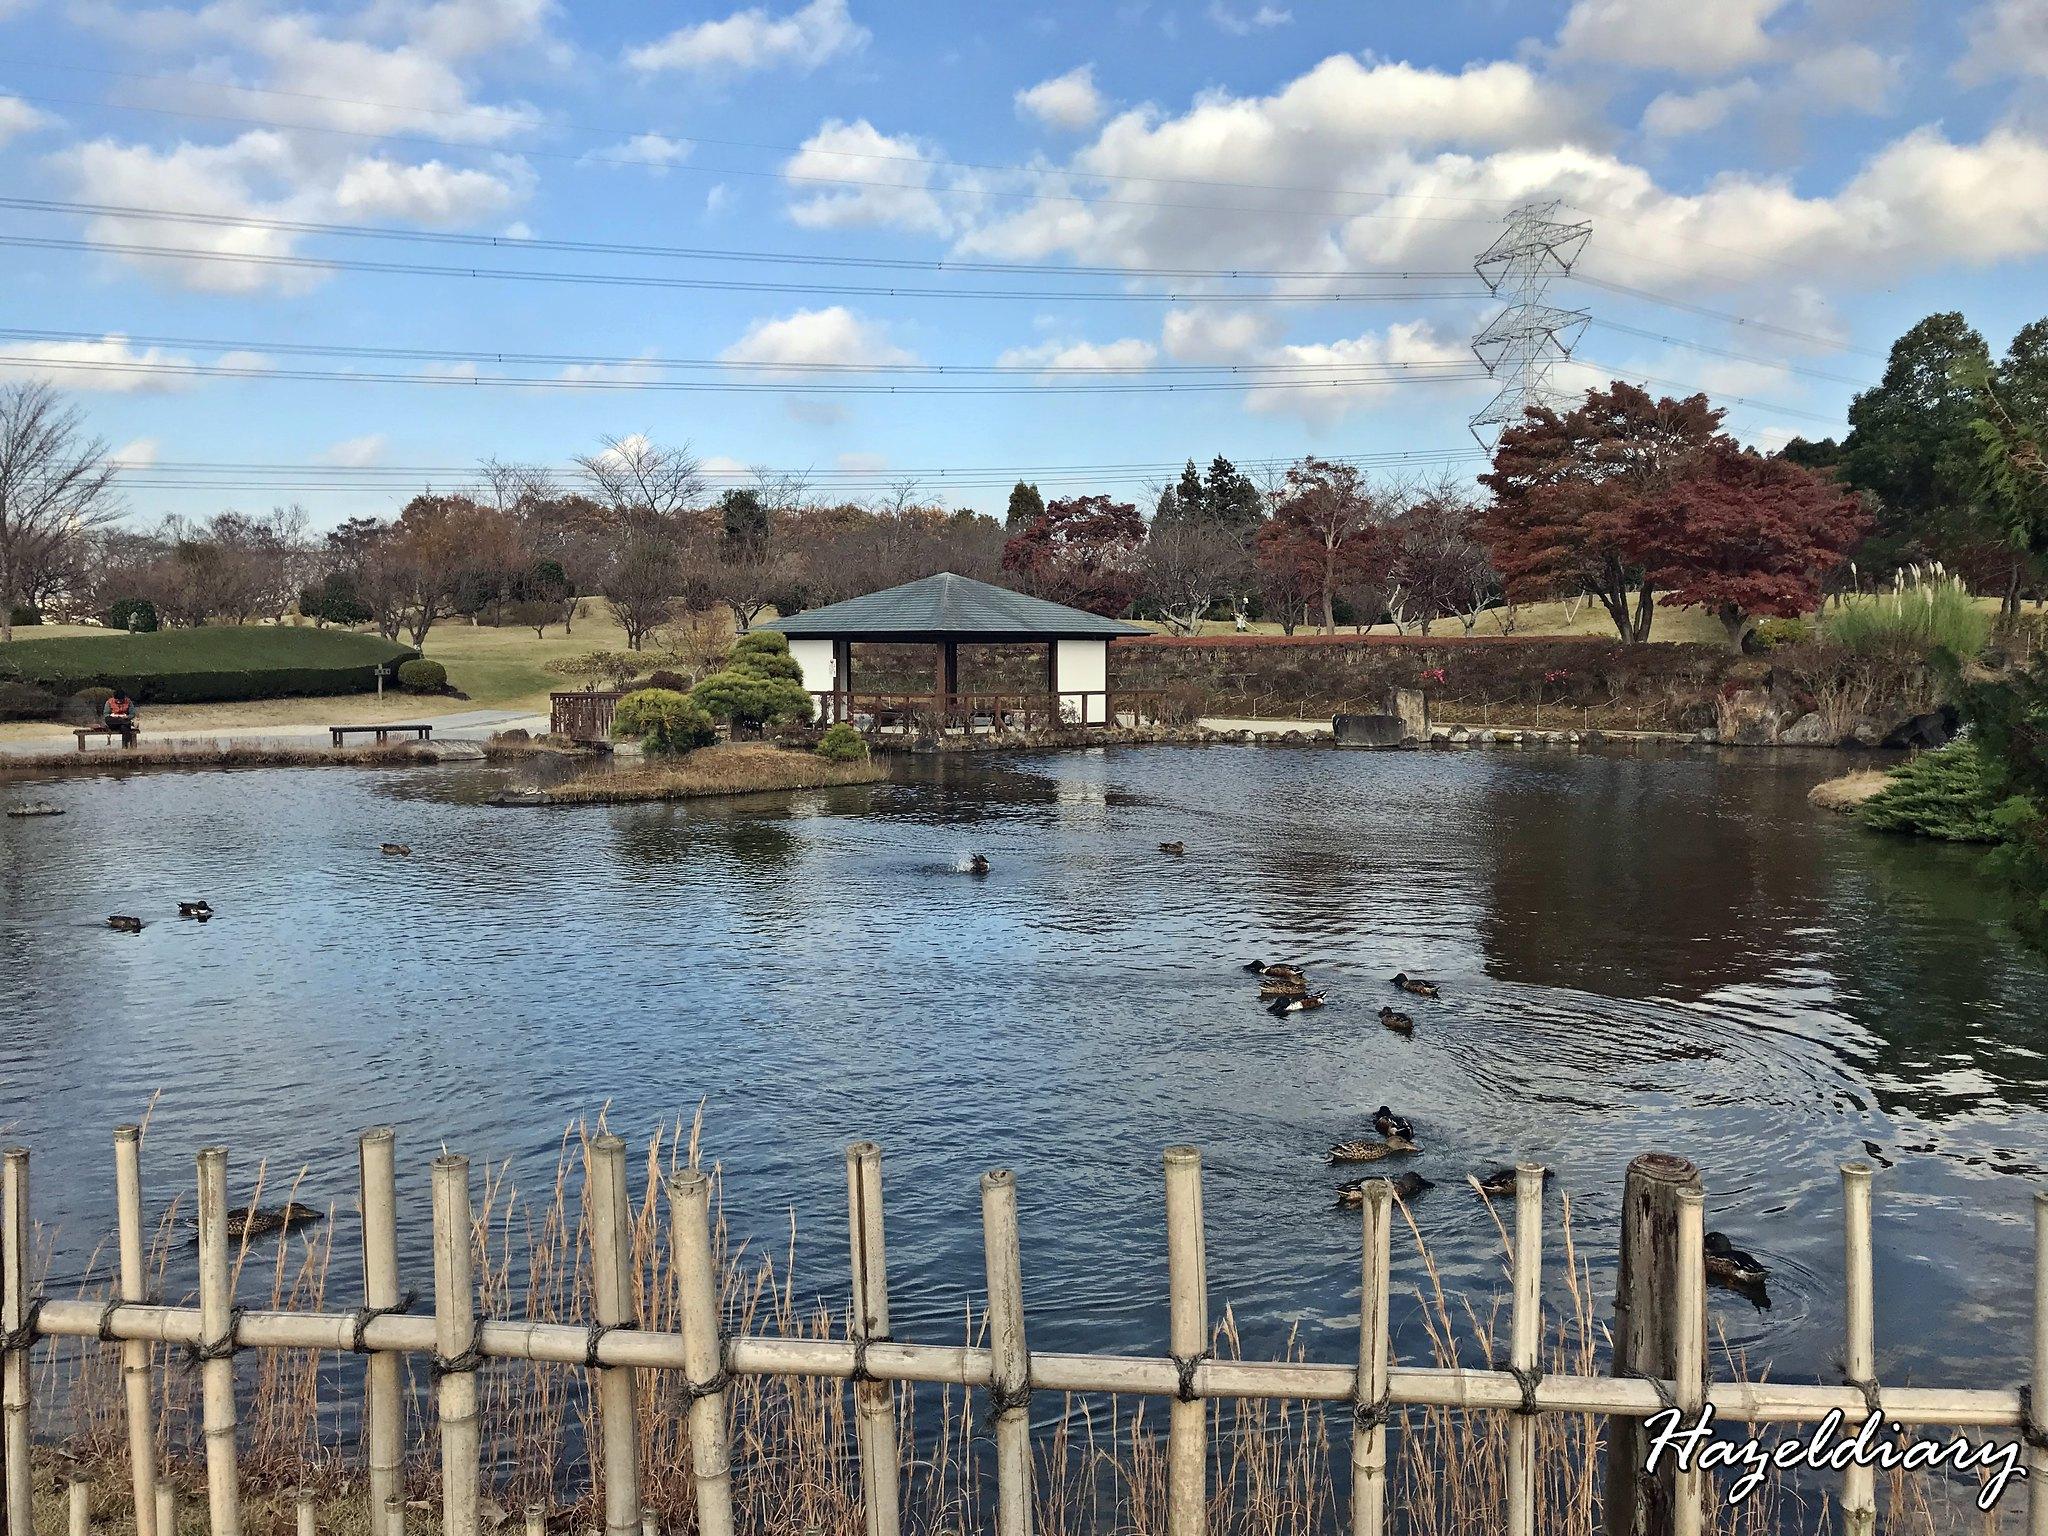 Ushiku Daibutsu Japan-Lake